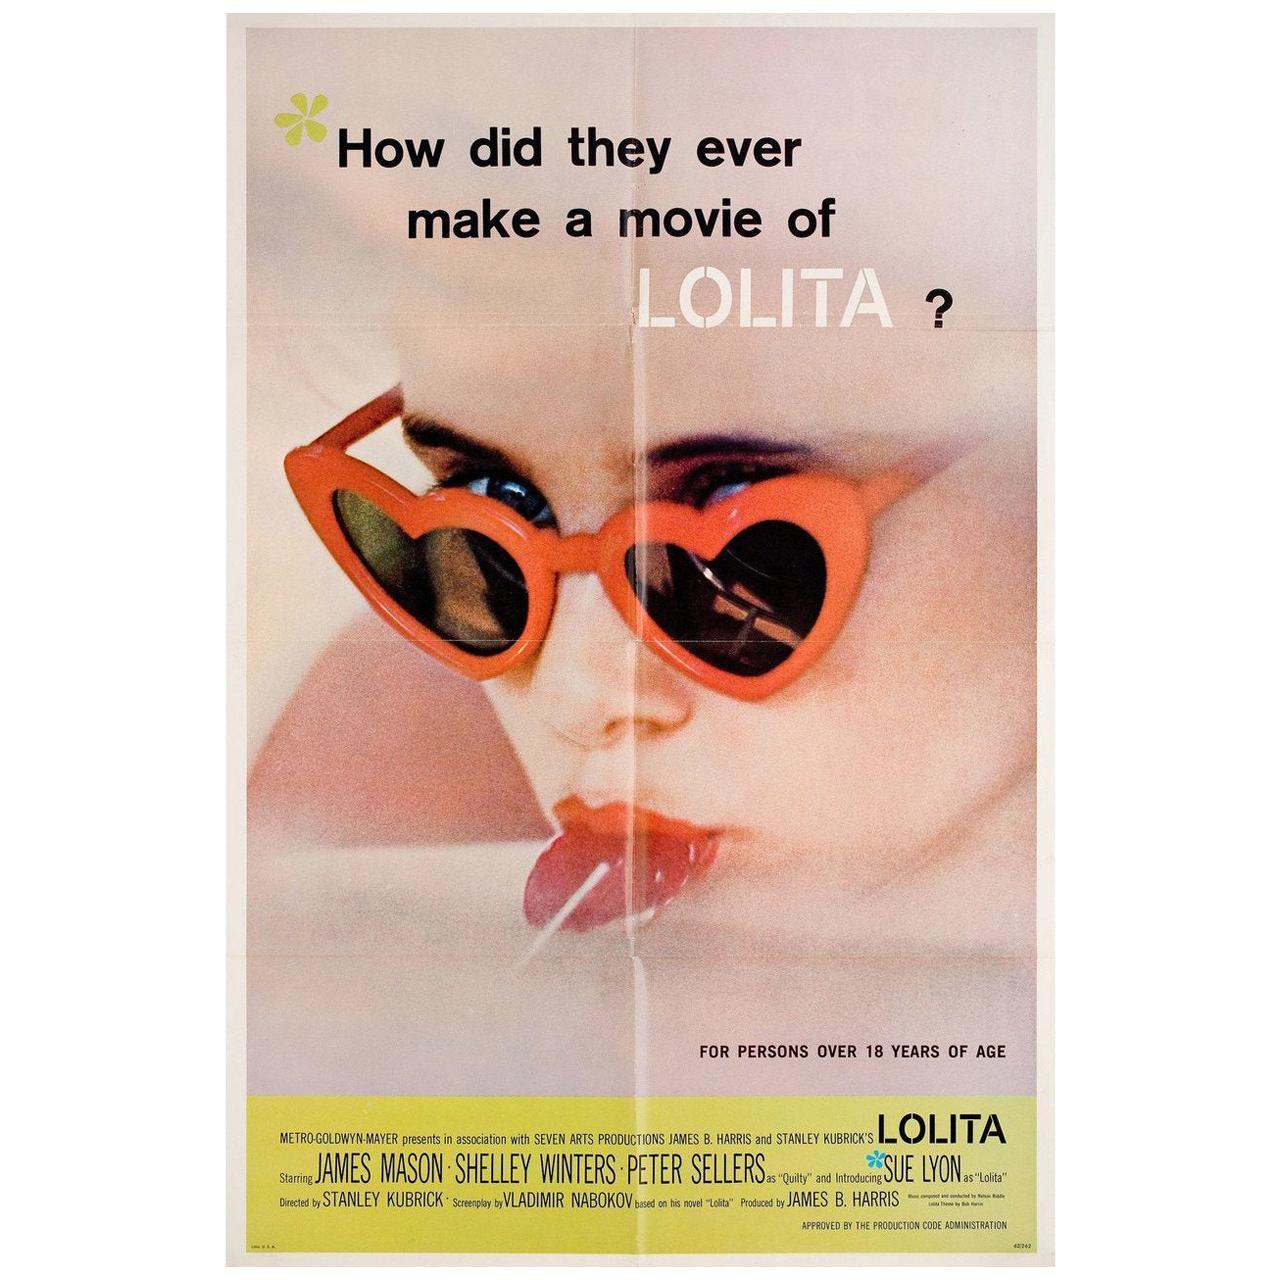 Lolita 1962 U.S. One Sheet Film Poster